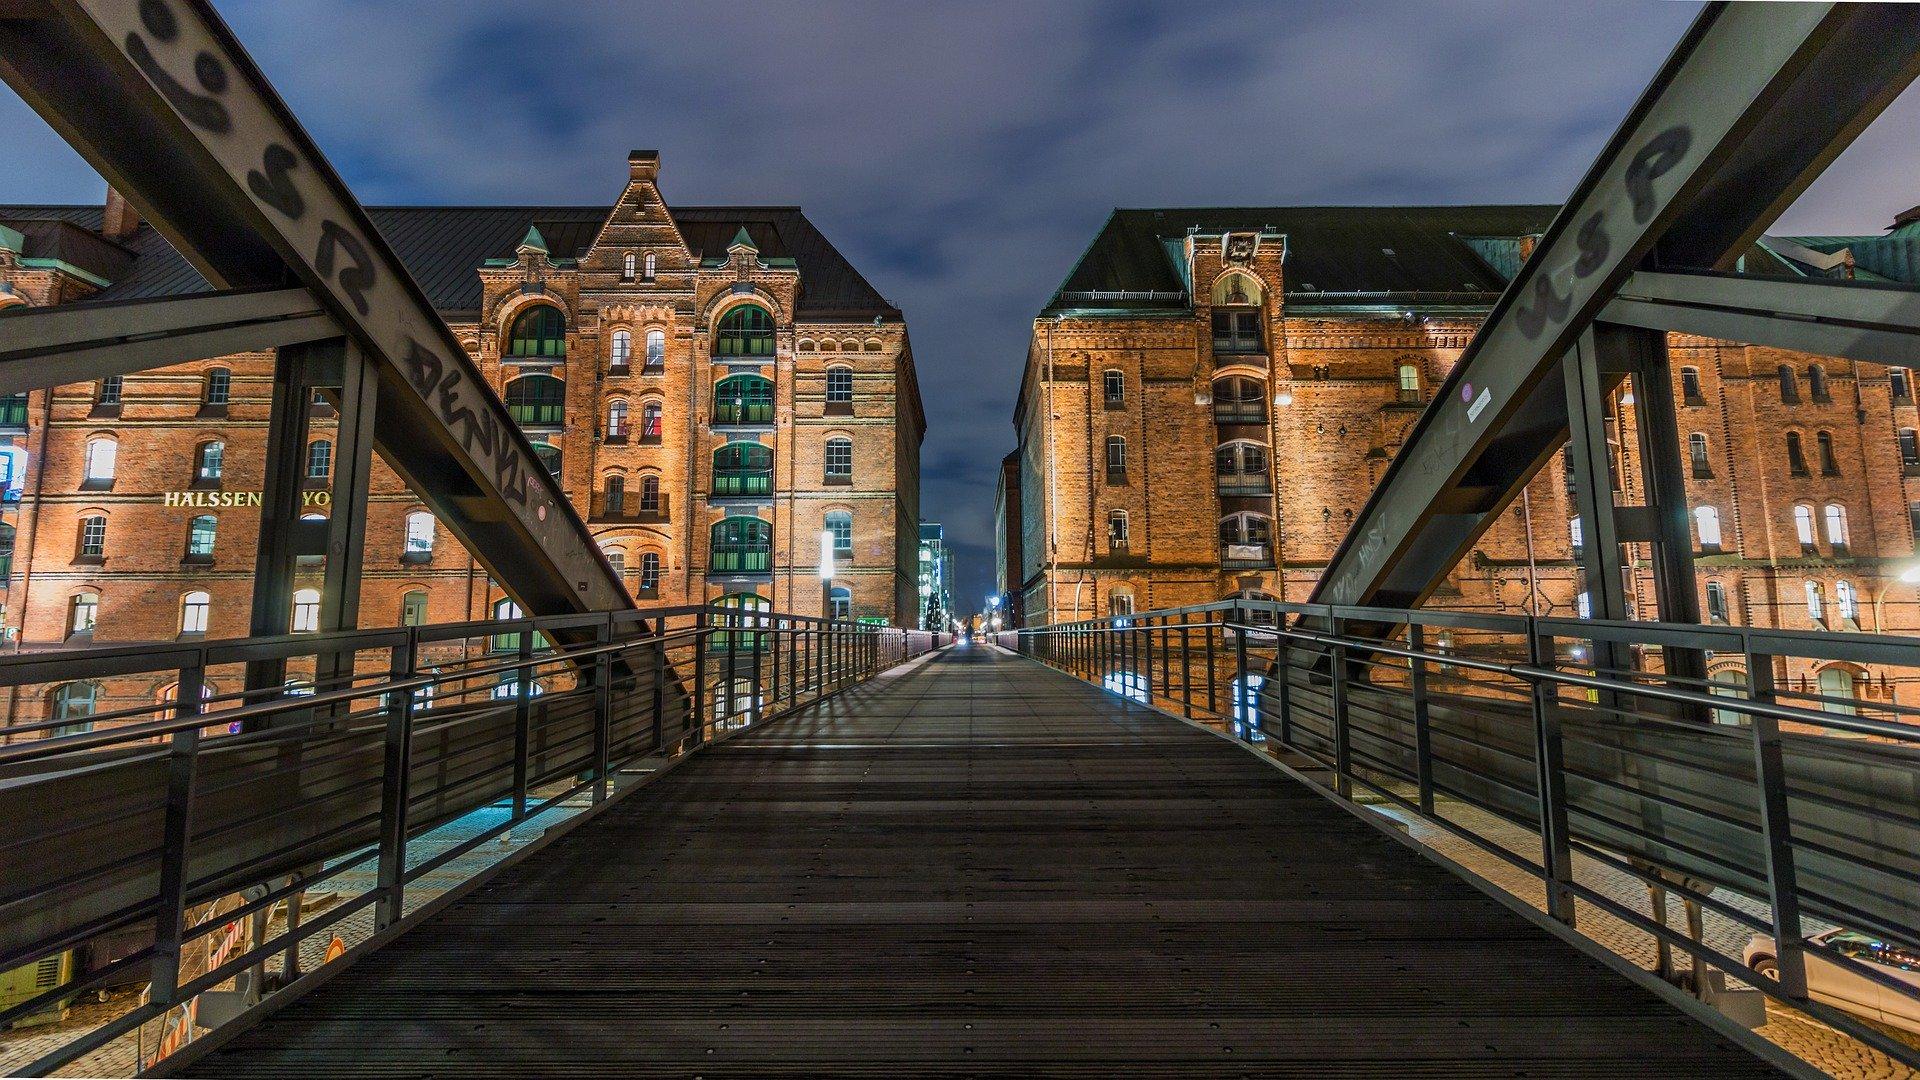 Gammel bro